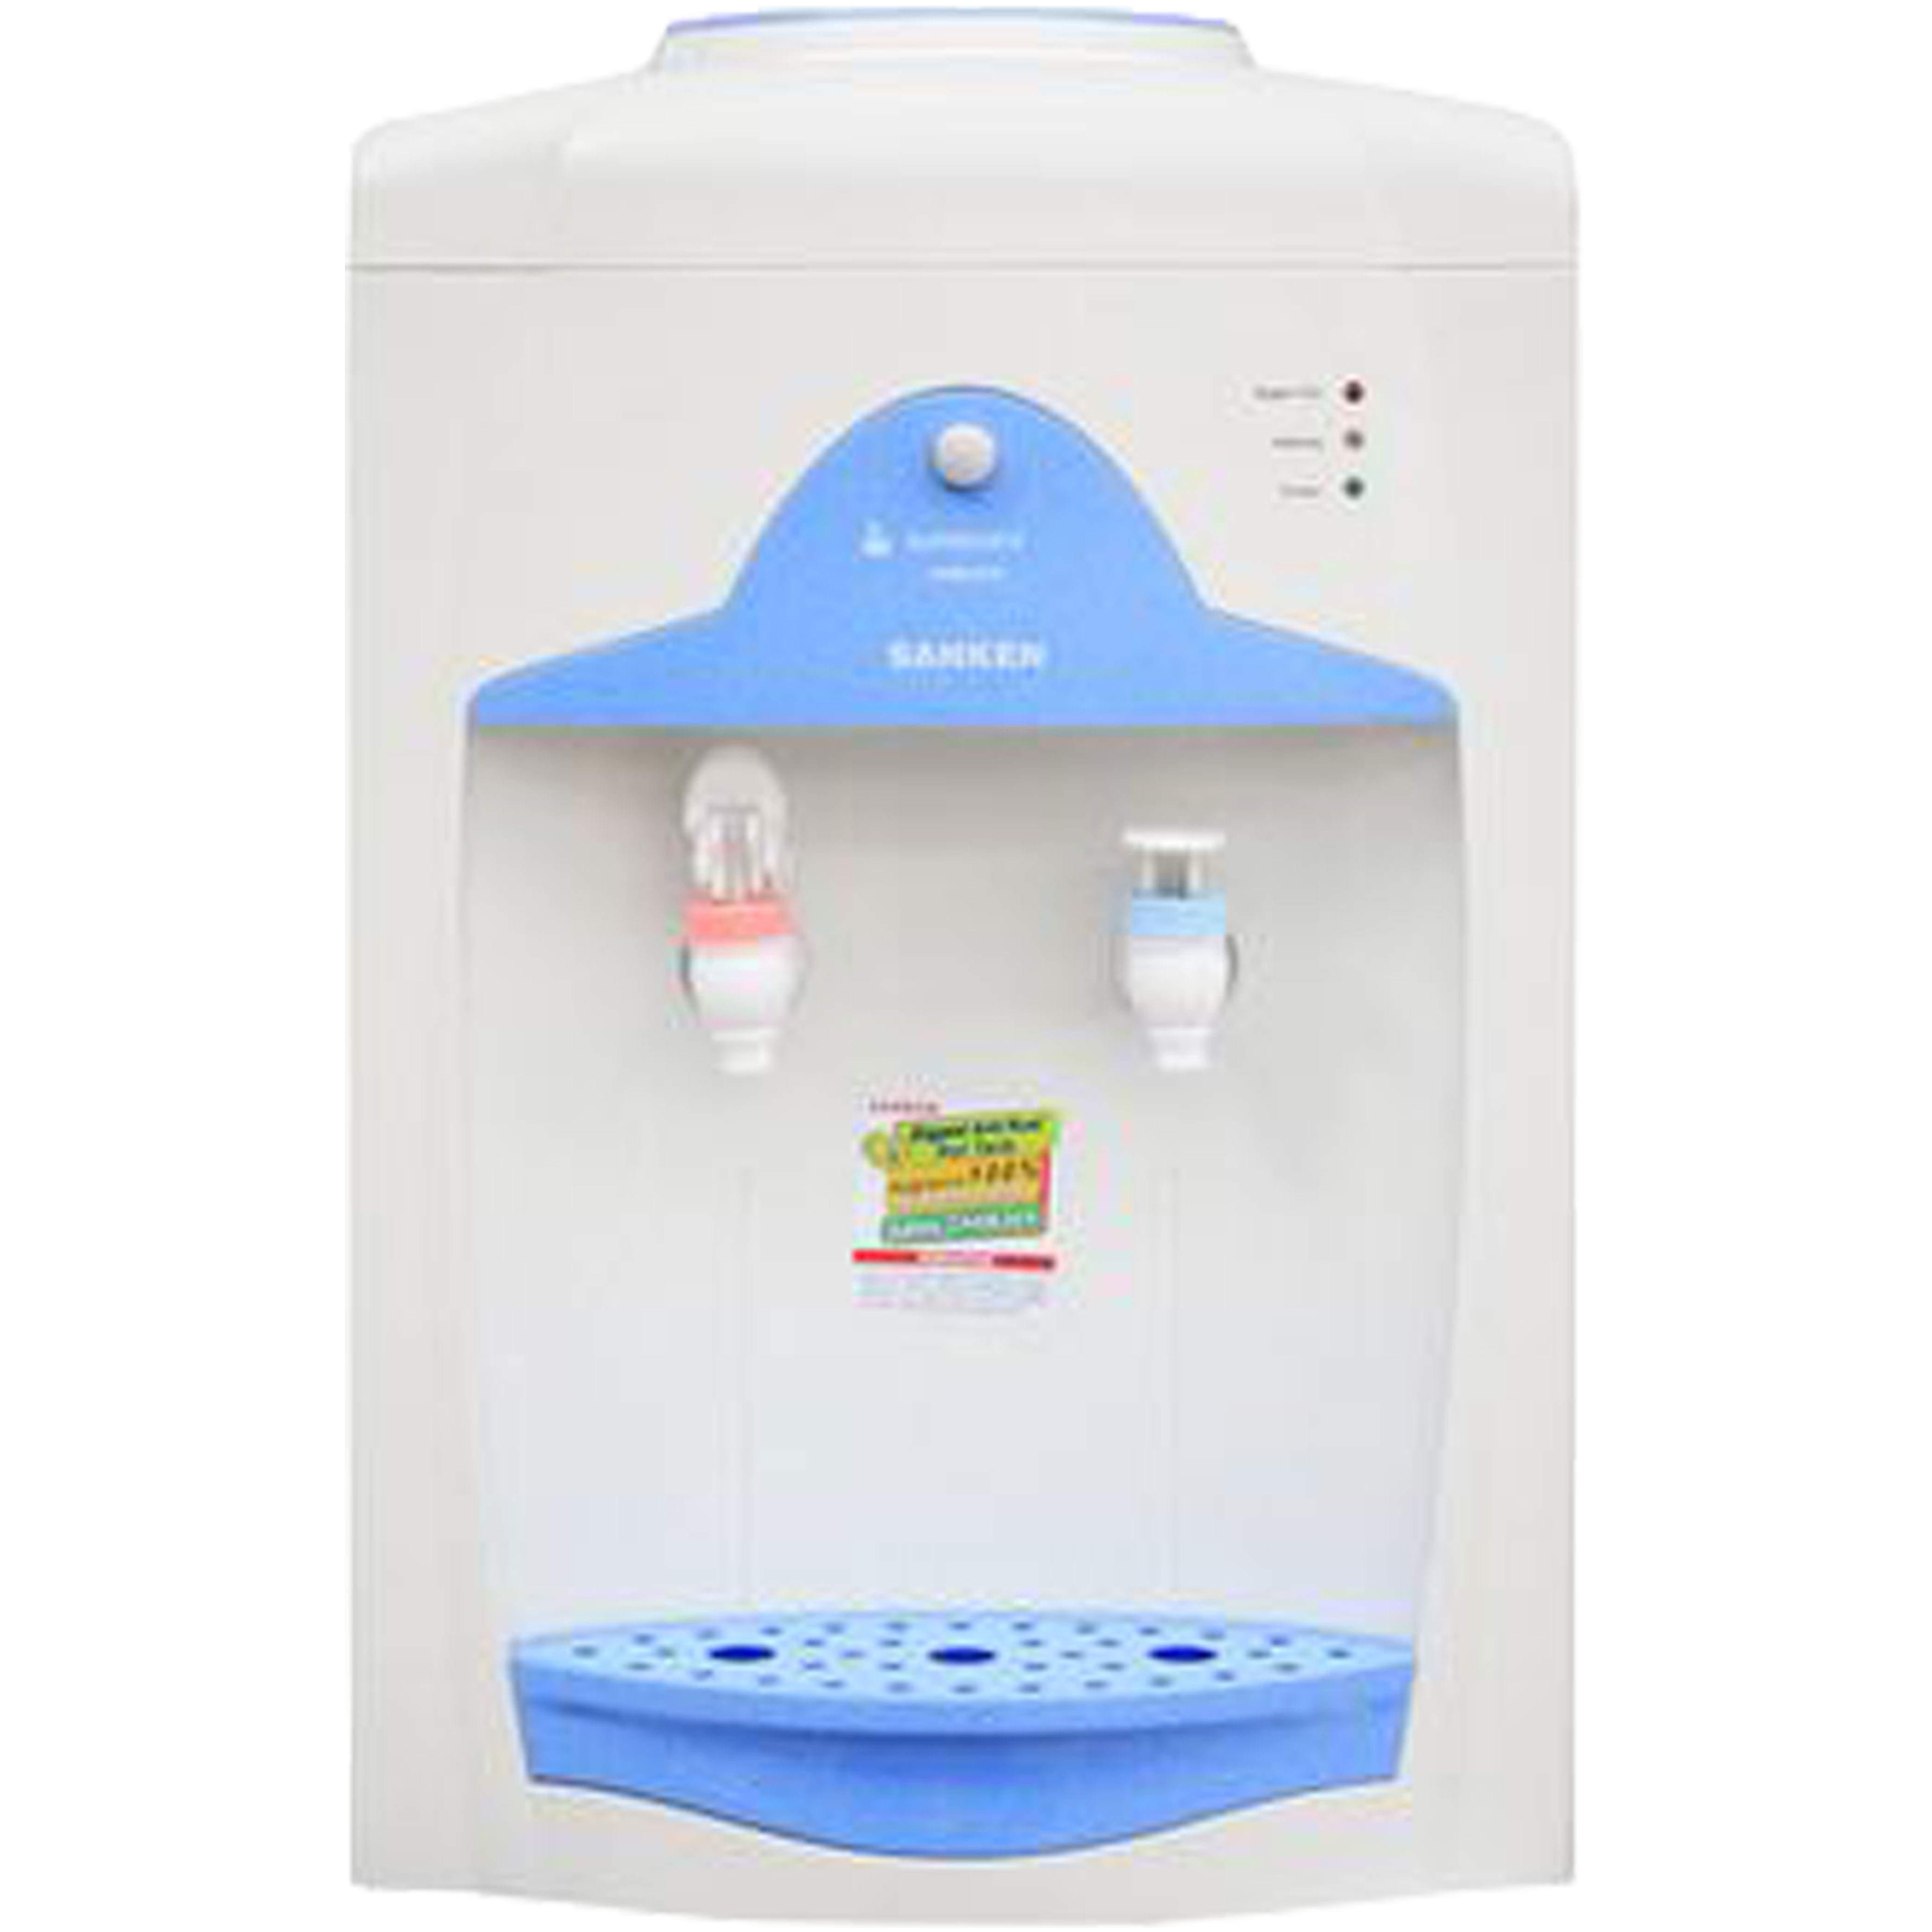 Sanken Dispenser Meja Panas Normal – HWN677/678